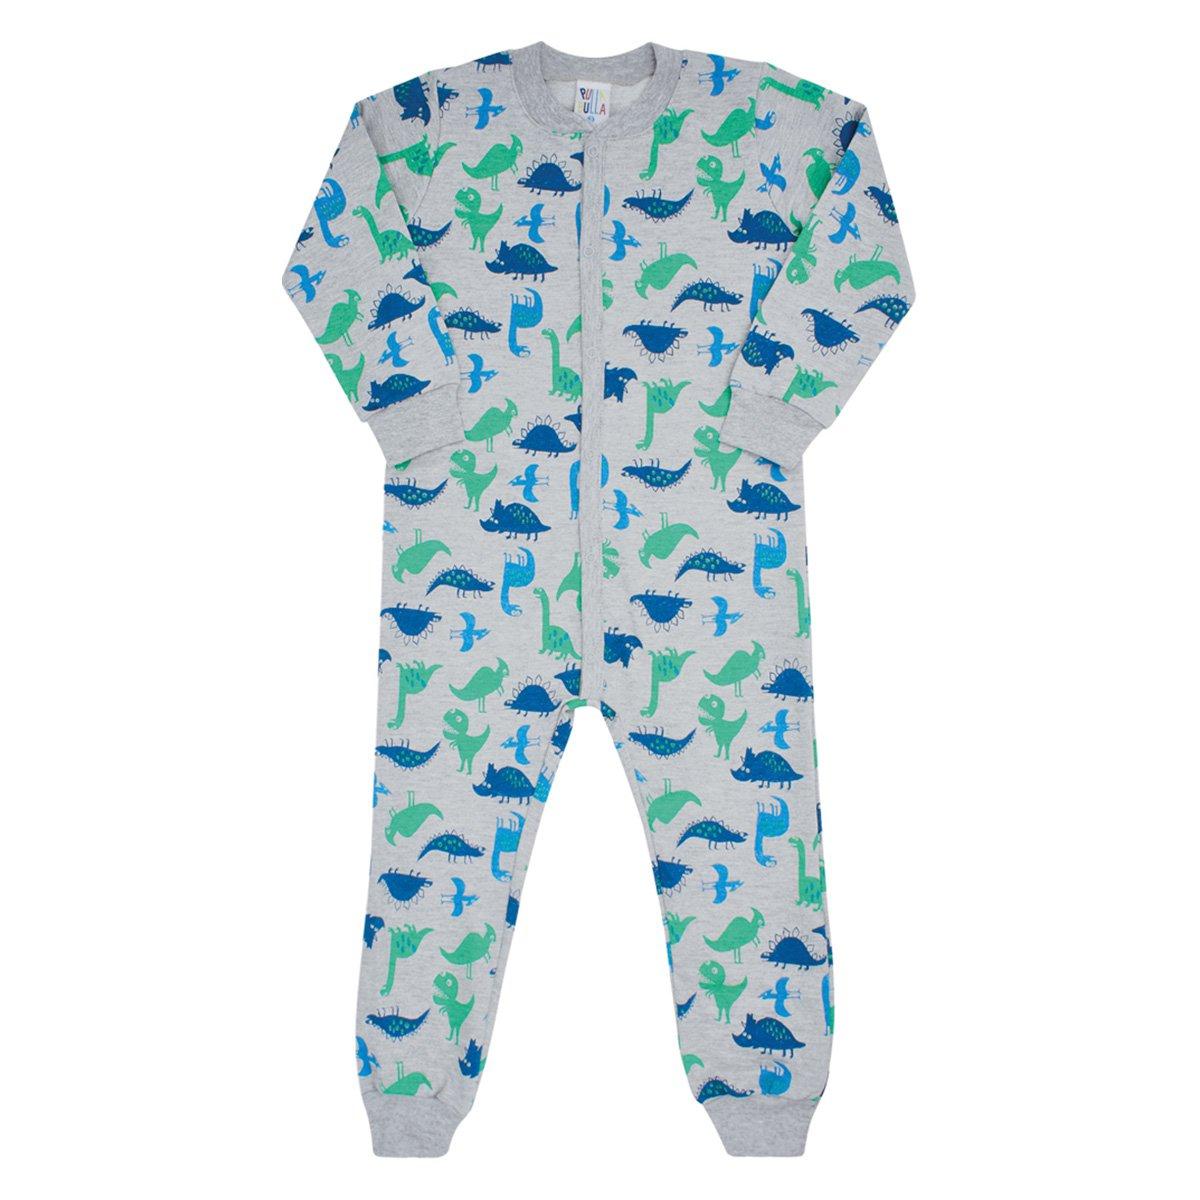 Pijama Bebê Macacão Pulla Bulla Dino Masculino